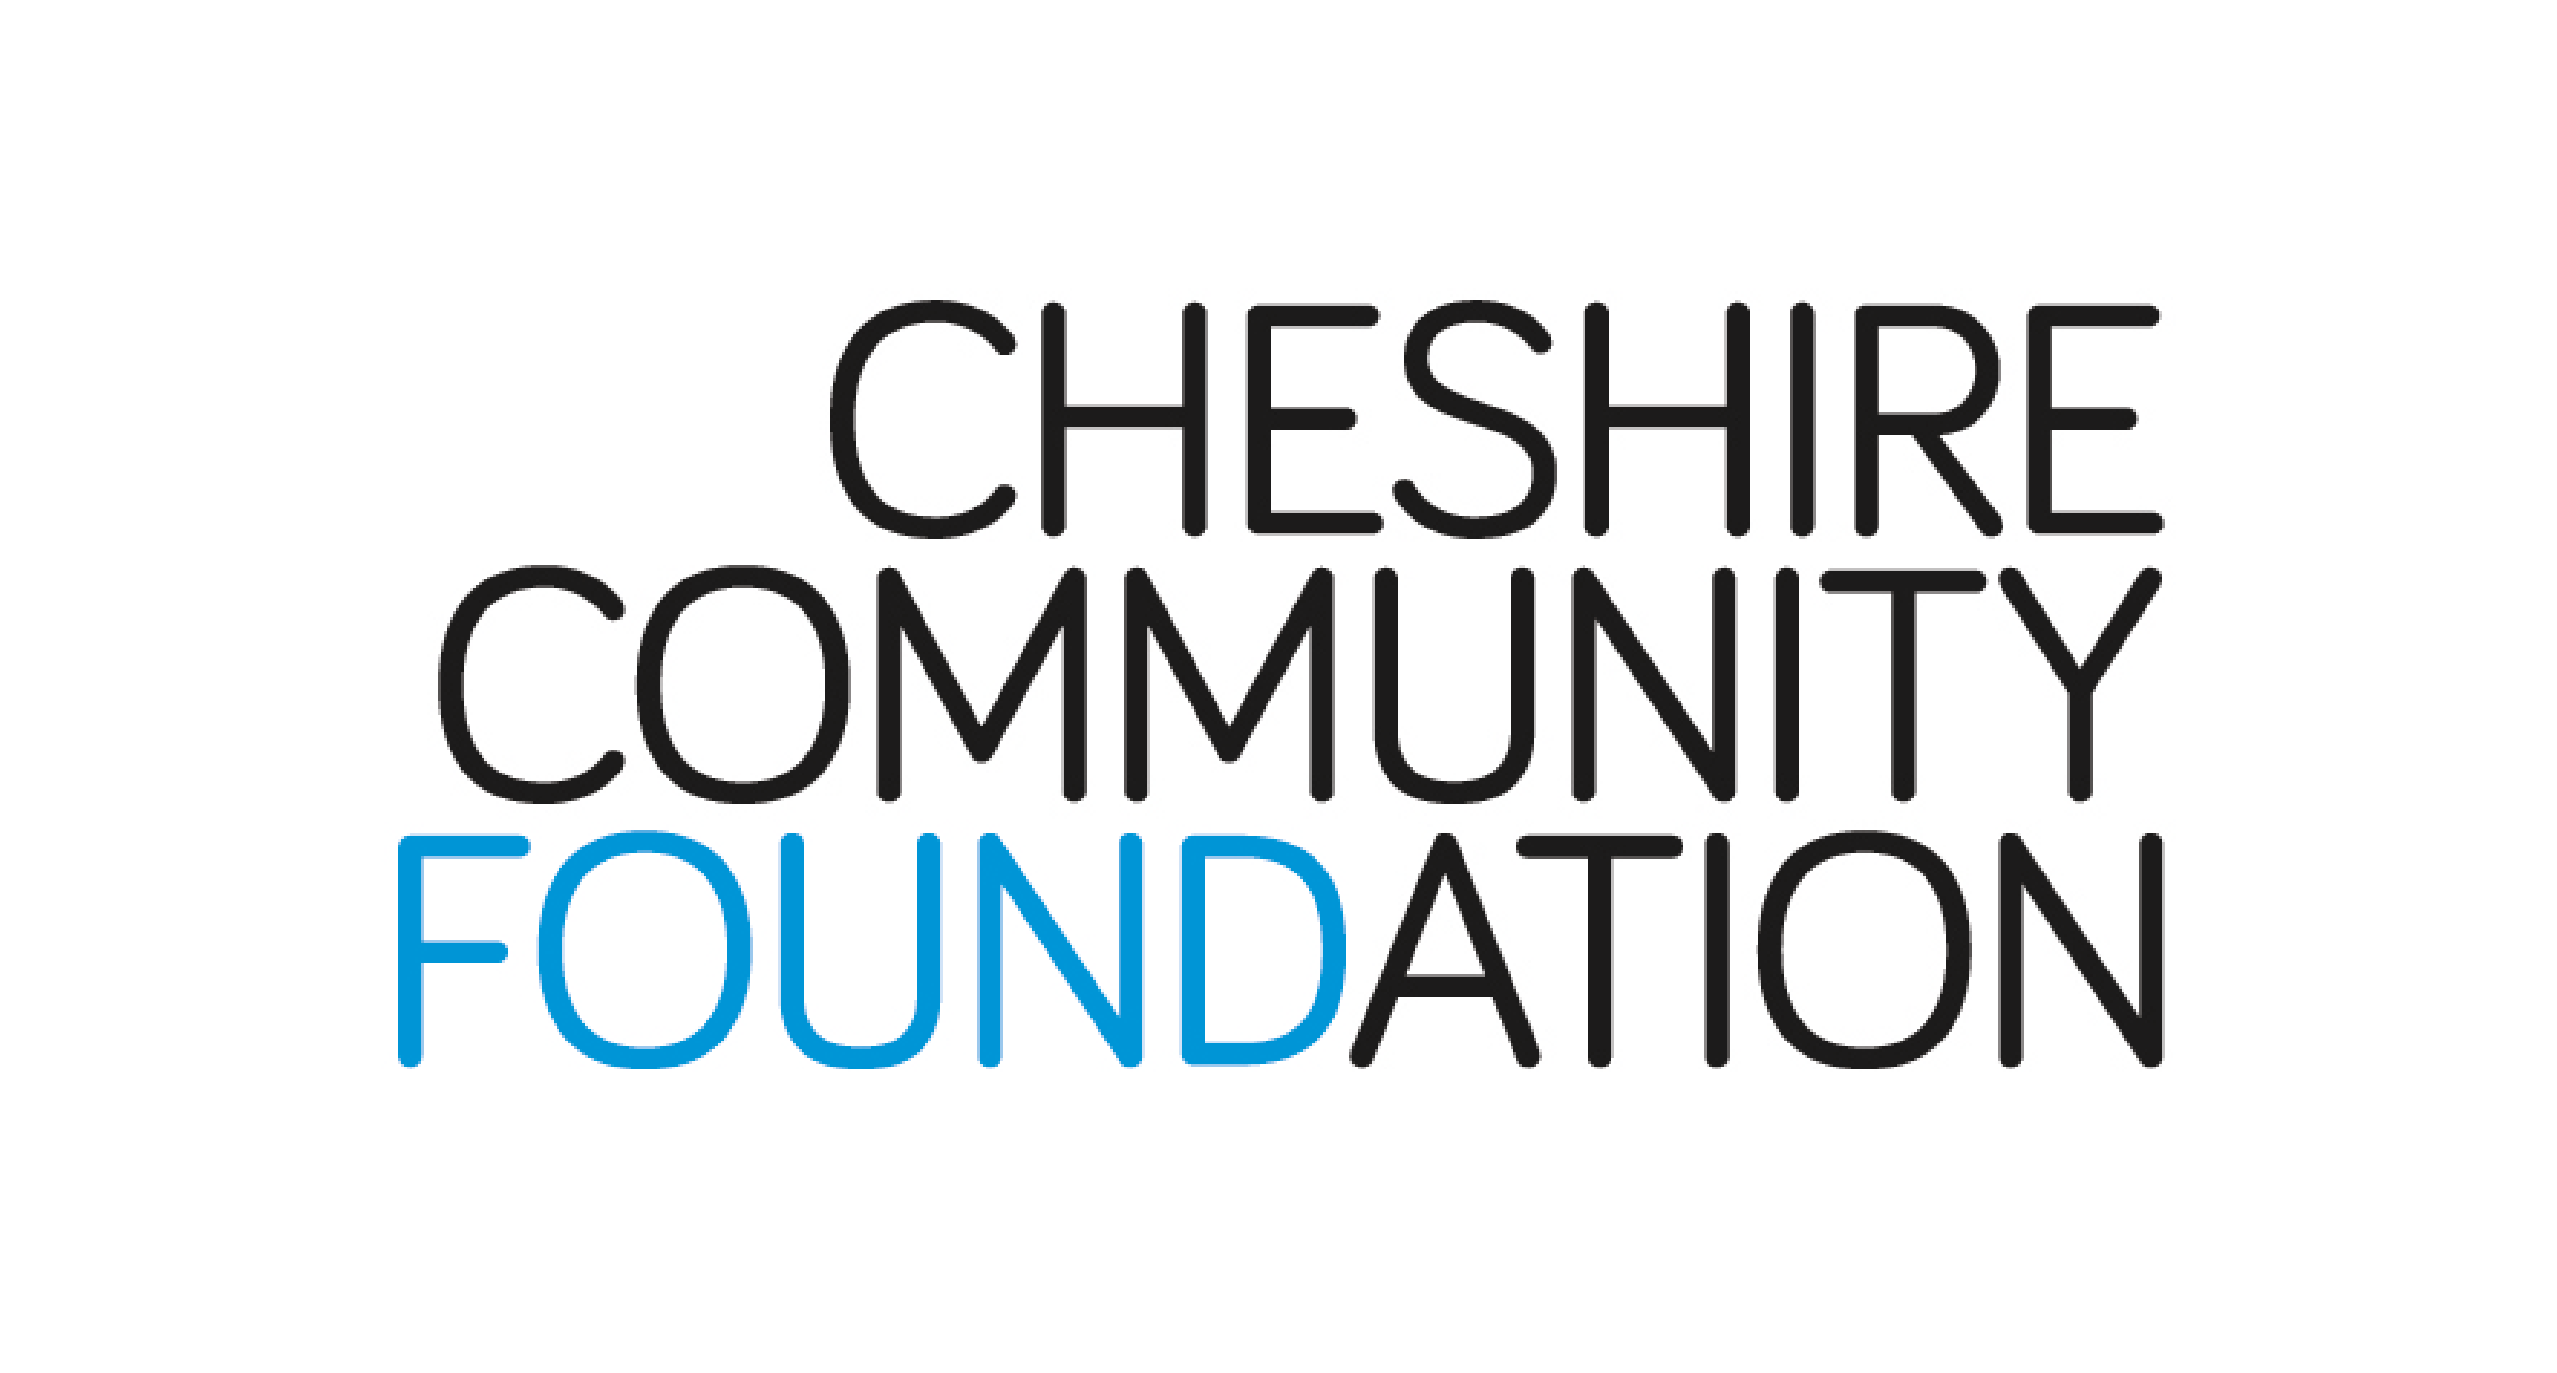 Cheshire community foundation logo